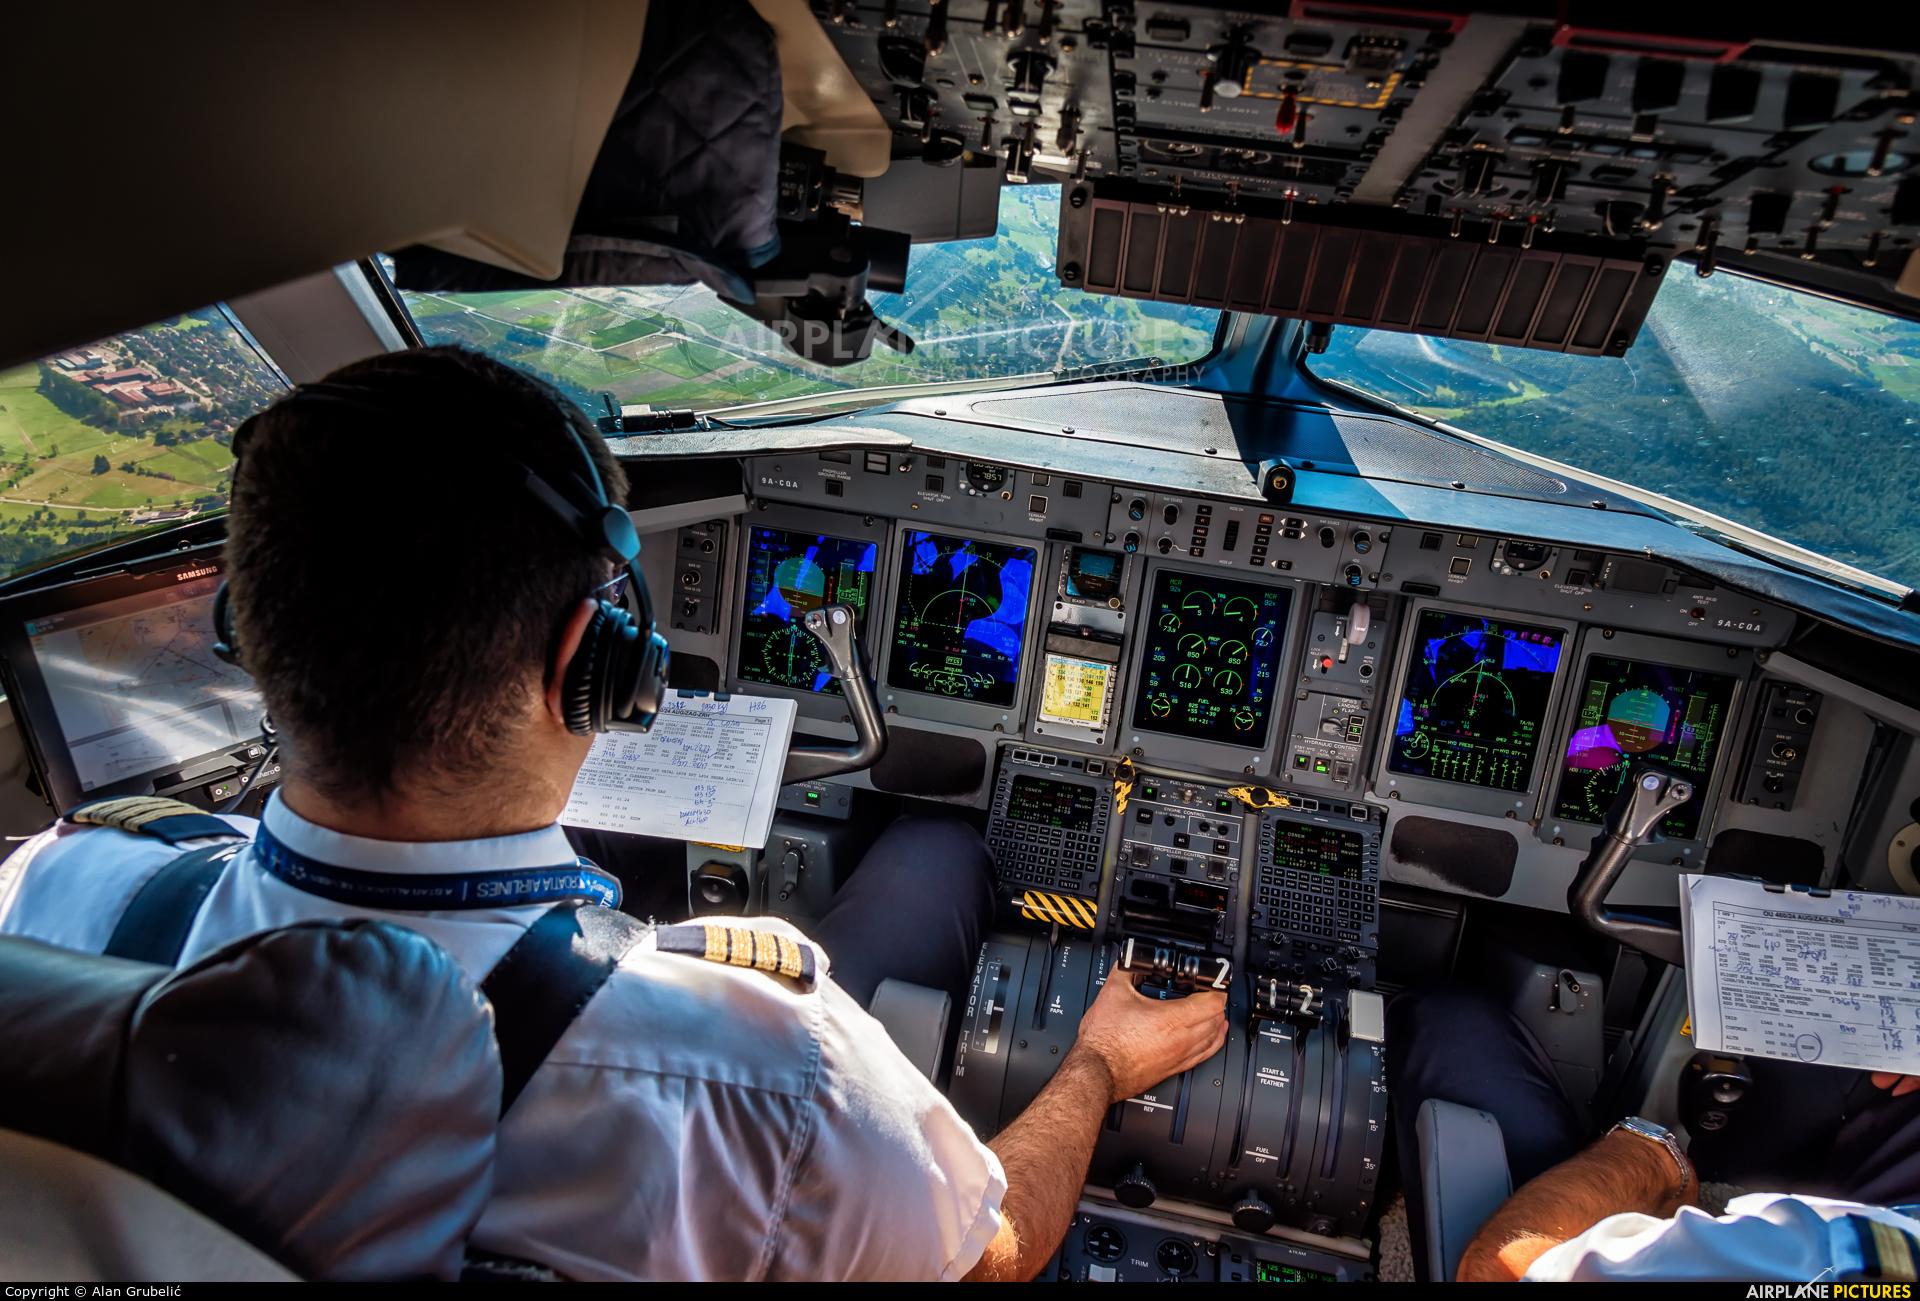 Croatia Airlines 9A-CQA aircraft at In Flight - Switzerland